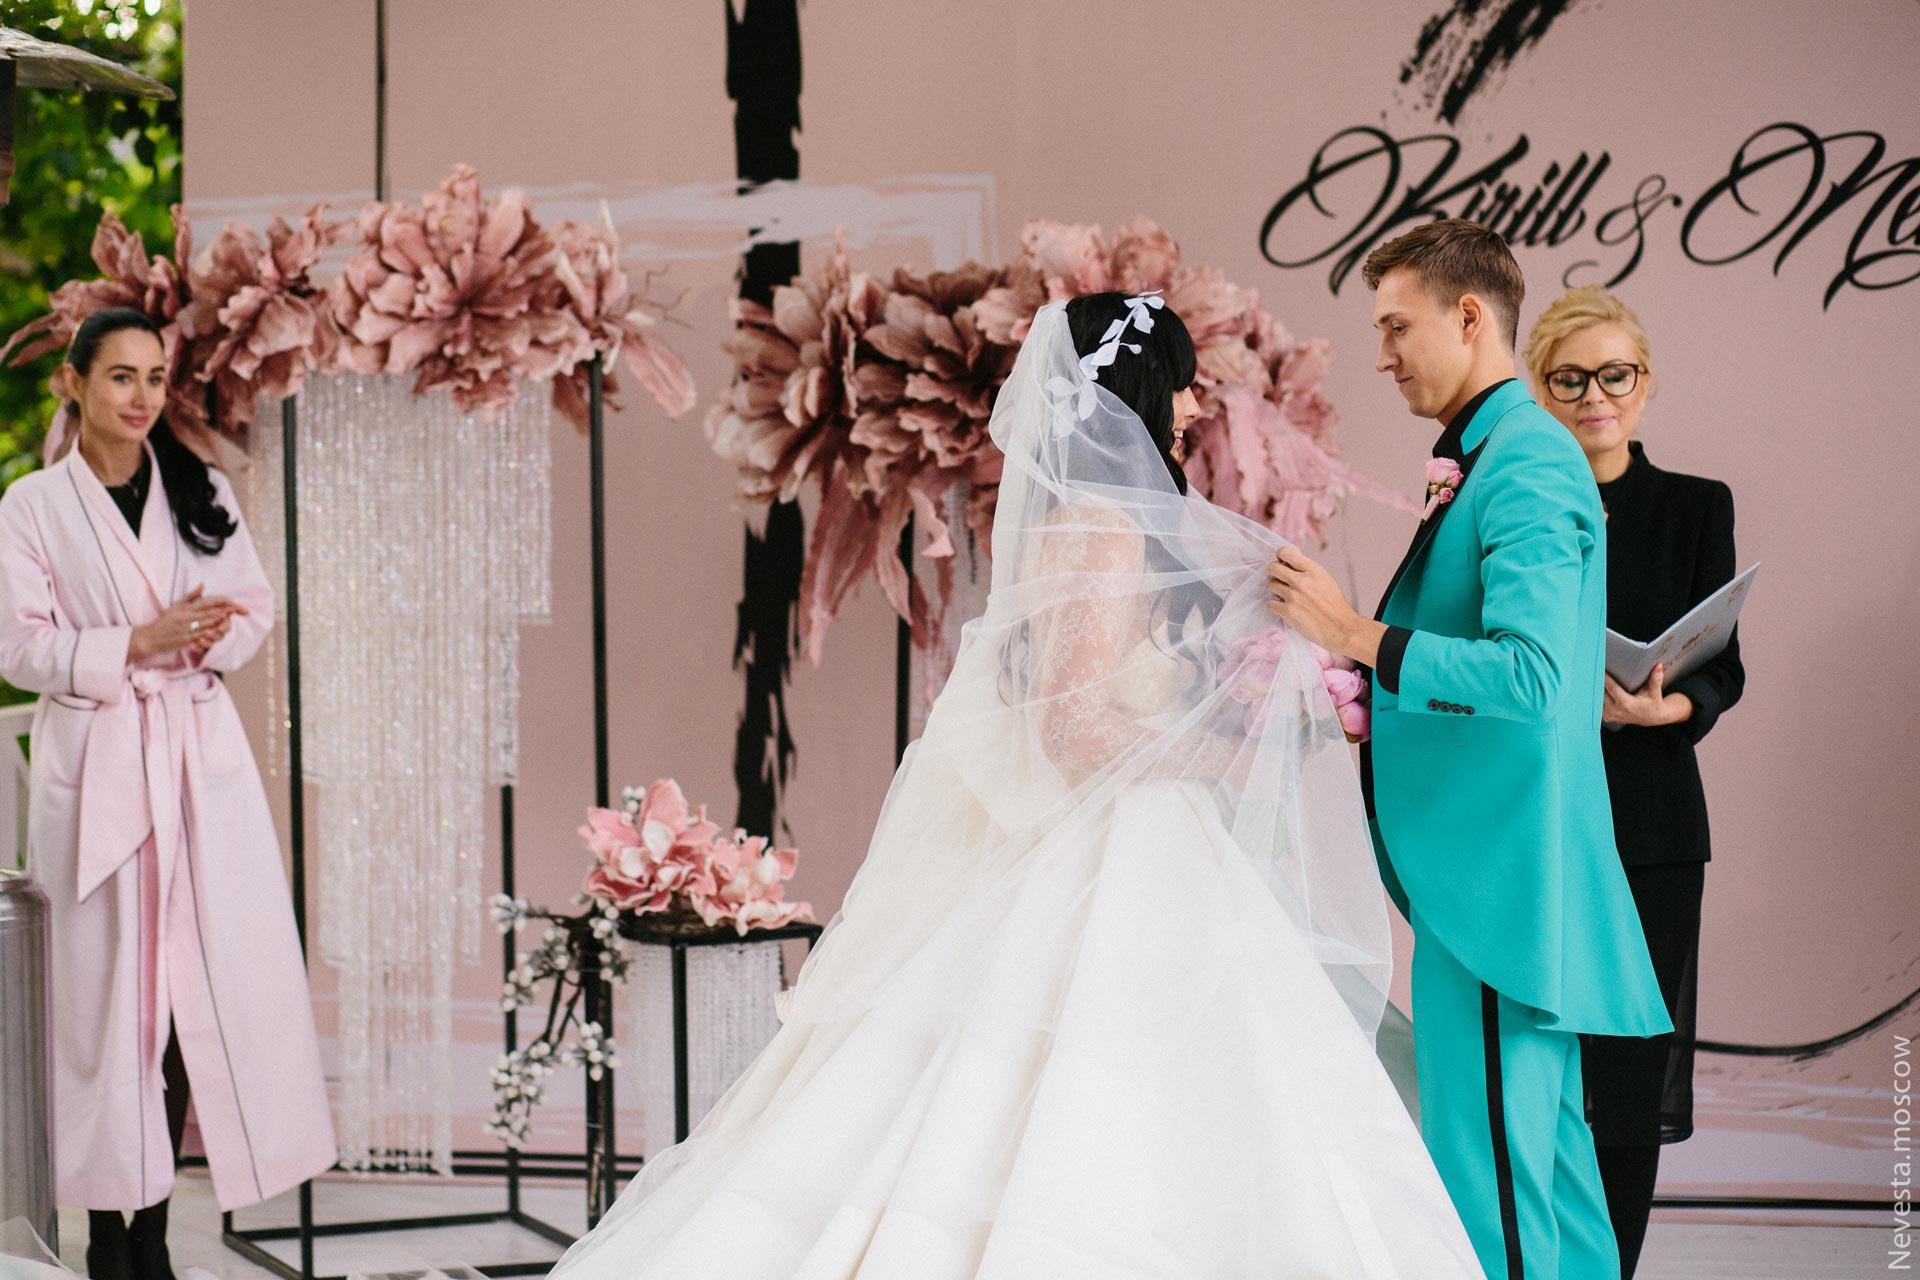 Свадьба Нелли Ермолаевой и Кирилла Андреева фото 28